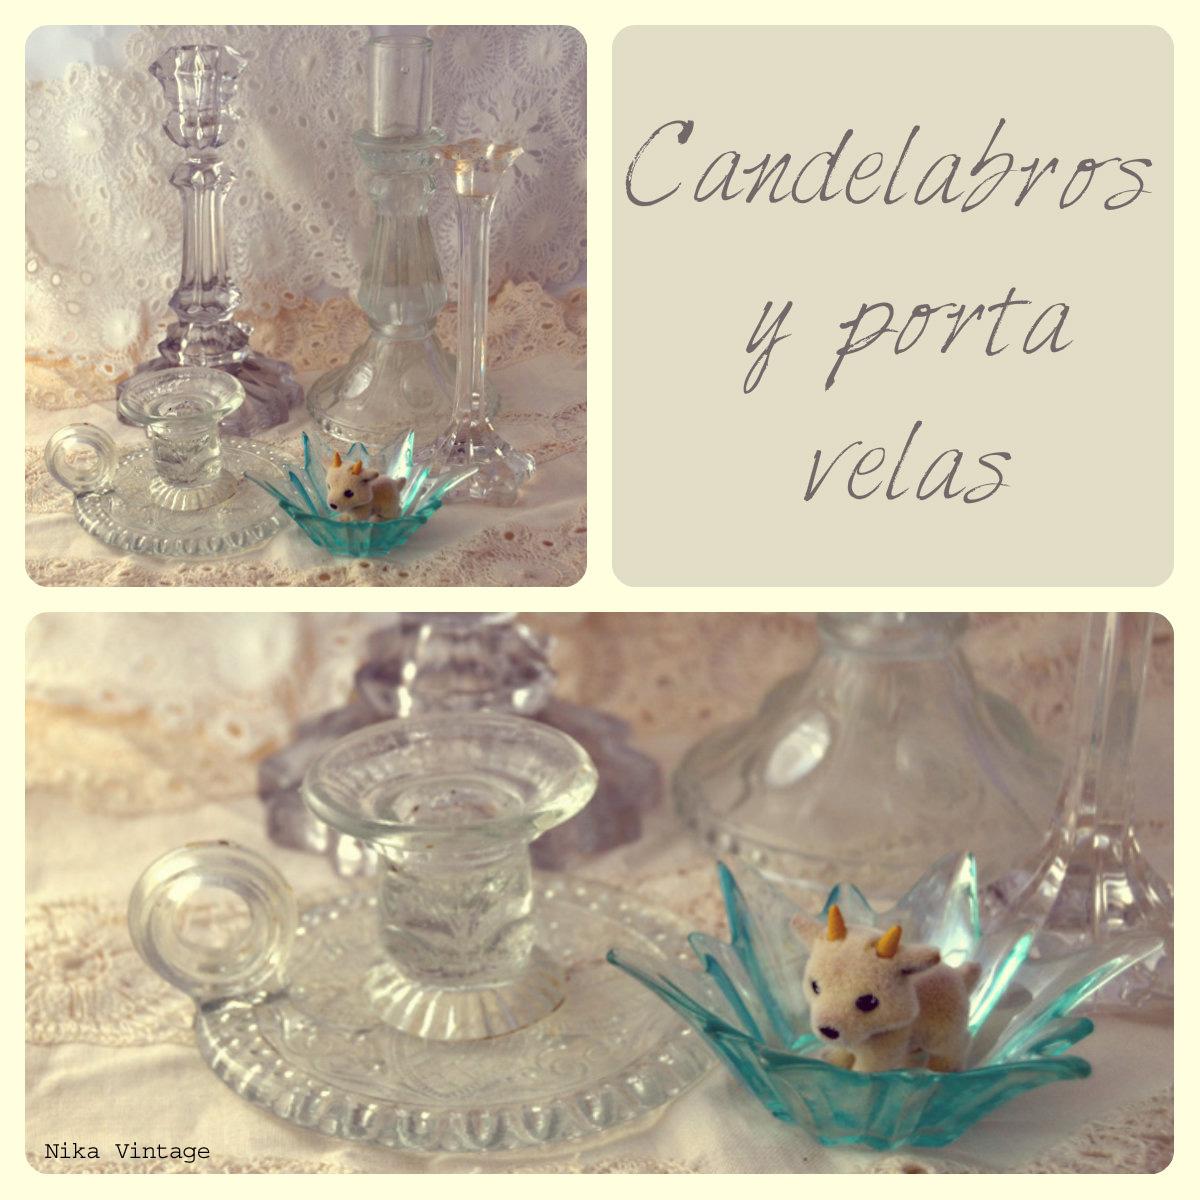 candelabros, candil, porta velas, complementos, objetos antiguos, mesa navideña, navidad, decoracion, cristal,